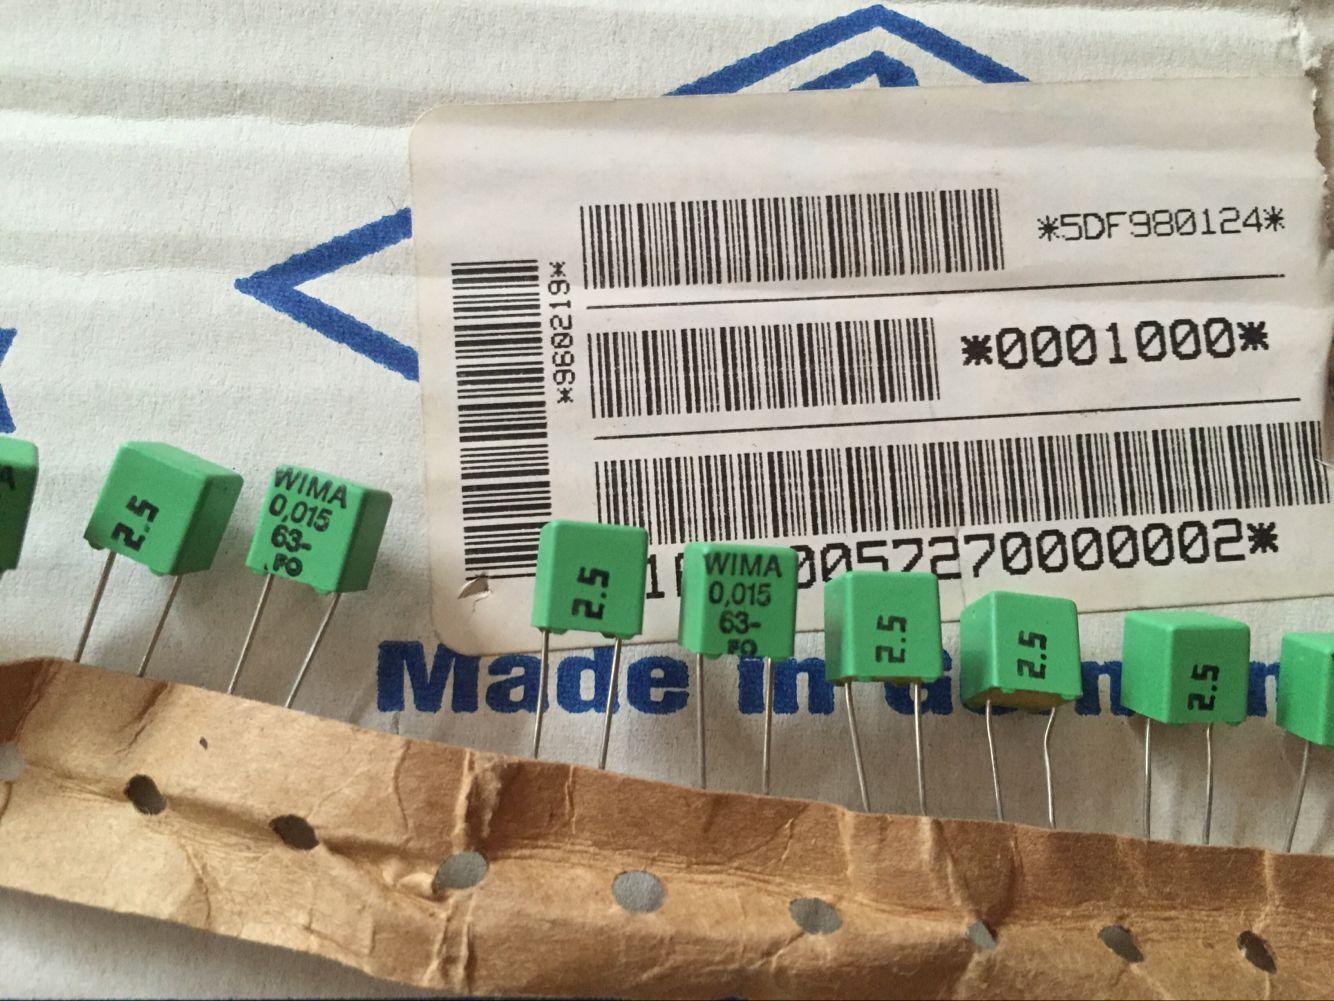 30pcs WIMA FKP-2 0.015UF/63V (15nF 153) Green Polypropylene Hay Film P=5 Free Shipping